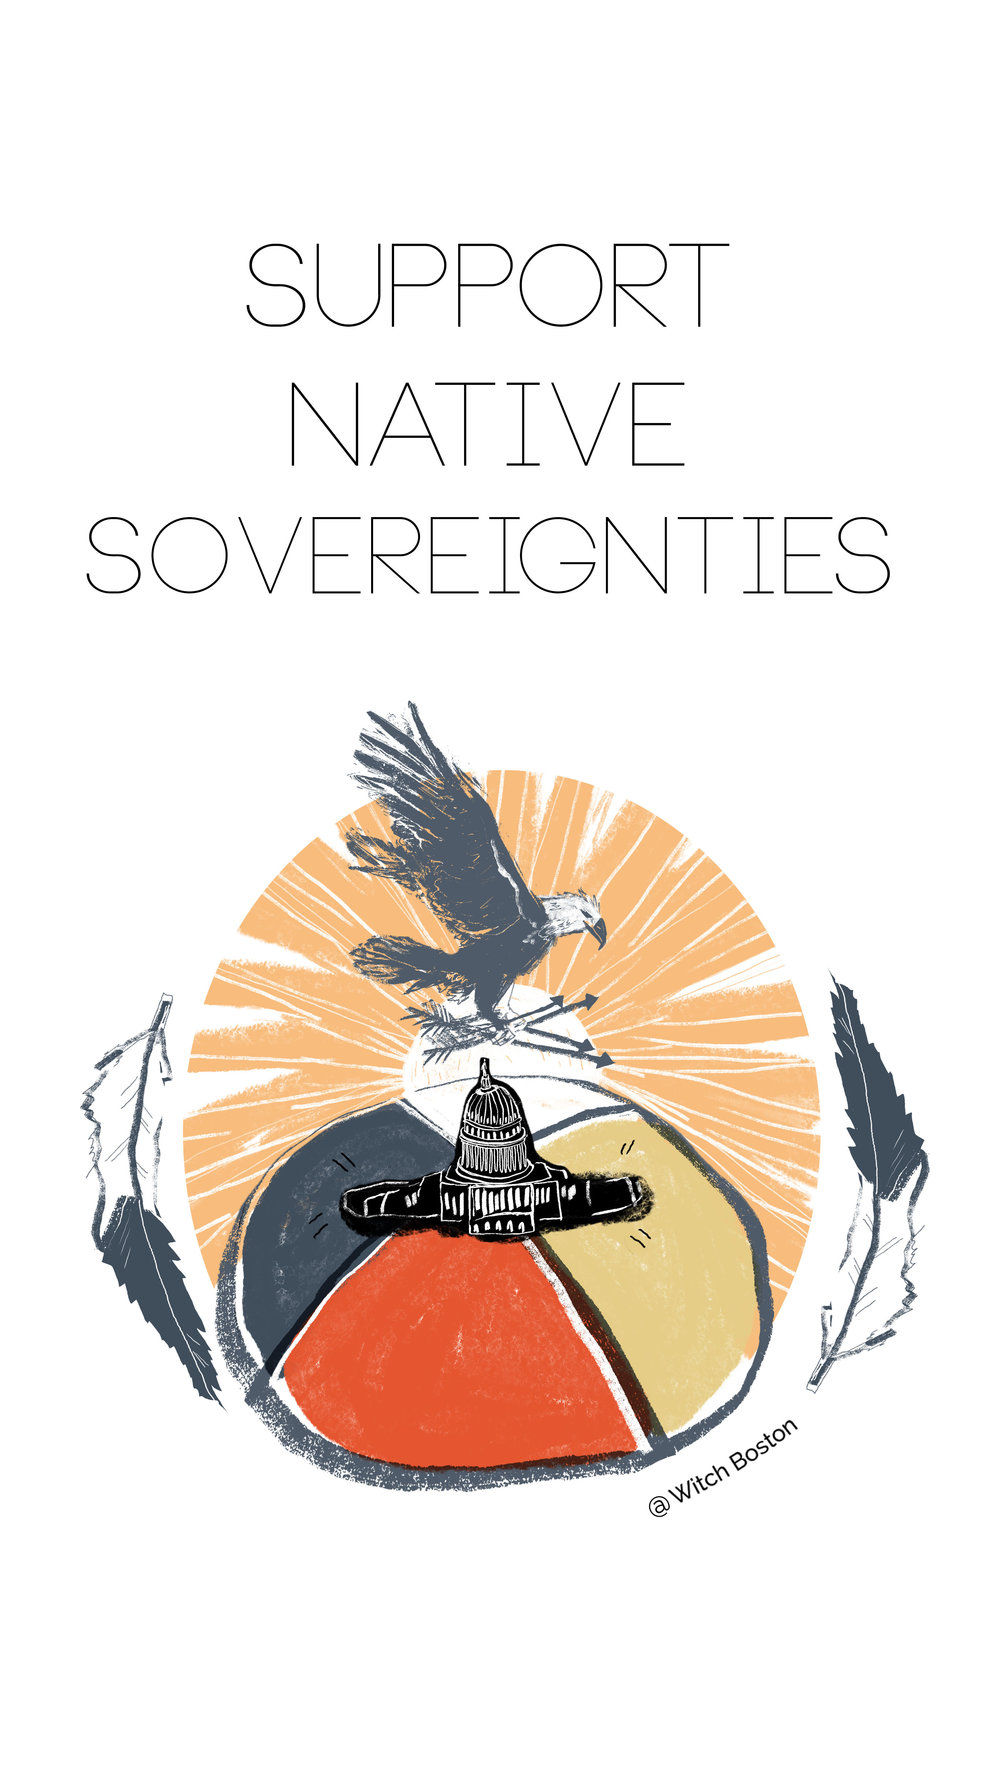 9-16_NATIVE_Sovereignties_witchboston.jpg